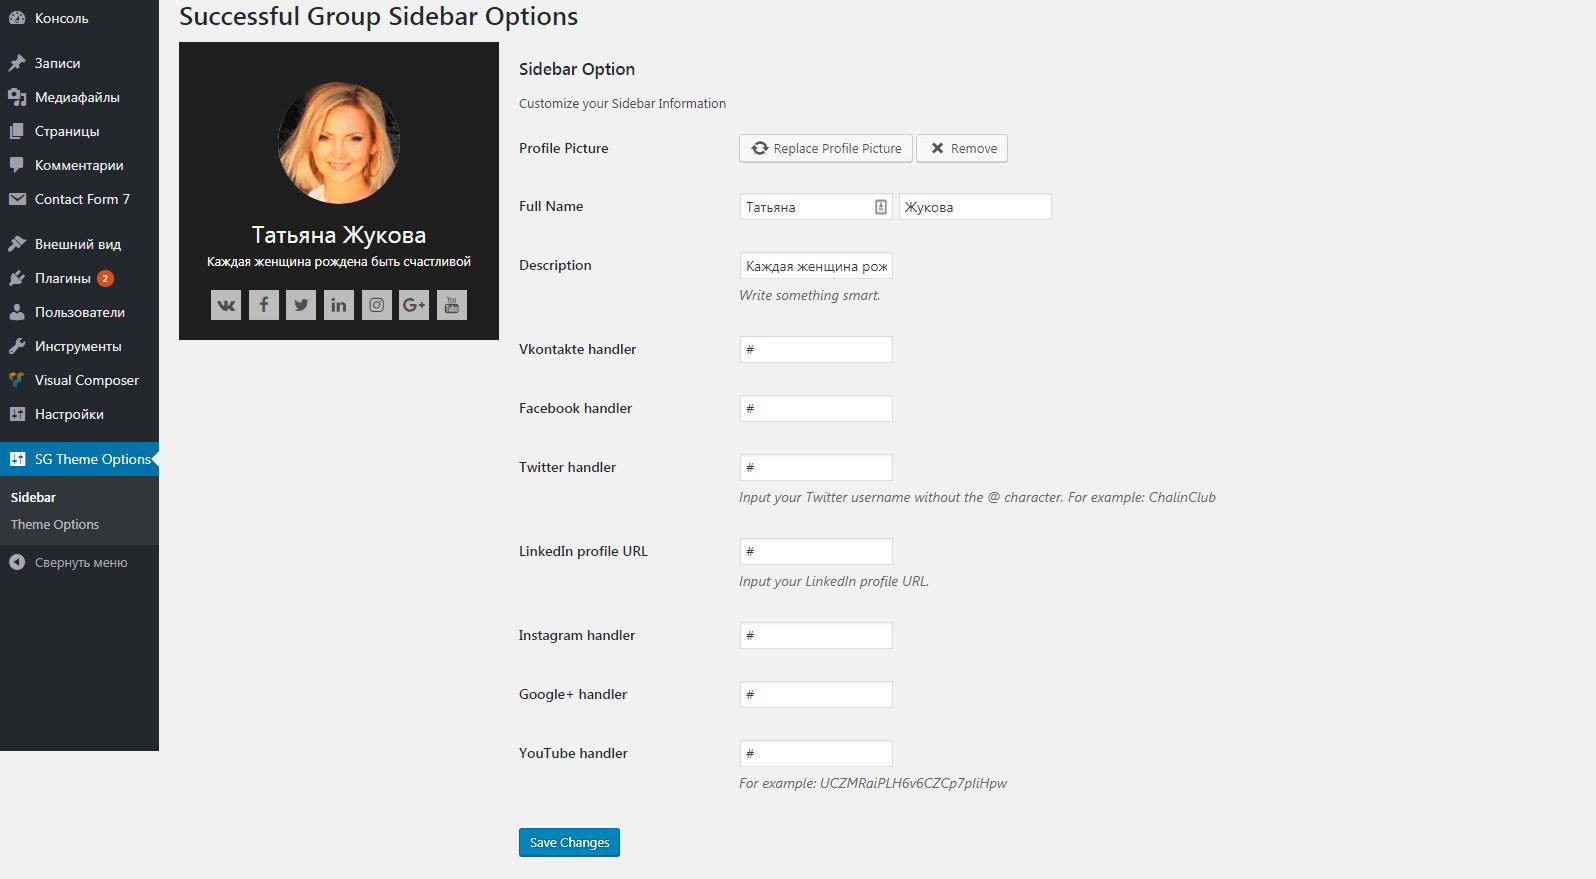 Шаблон для WordPress «Successful Group»-Сайдбар-управление